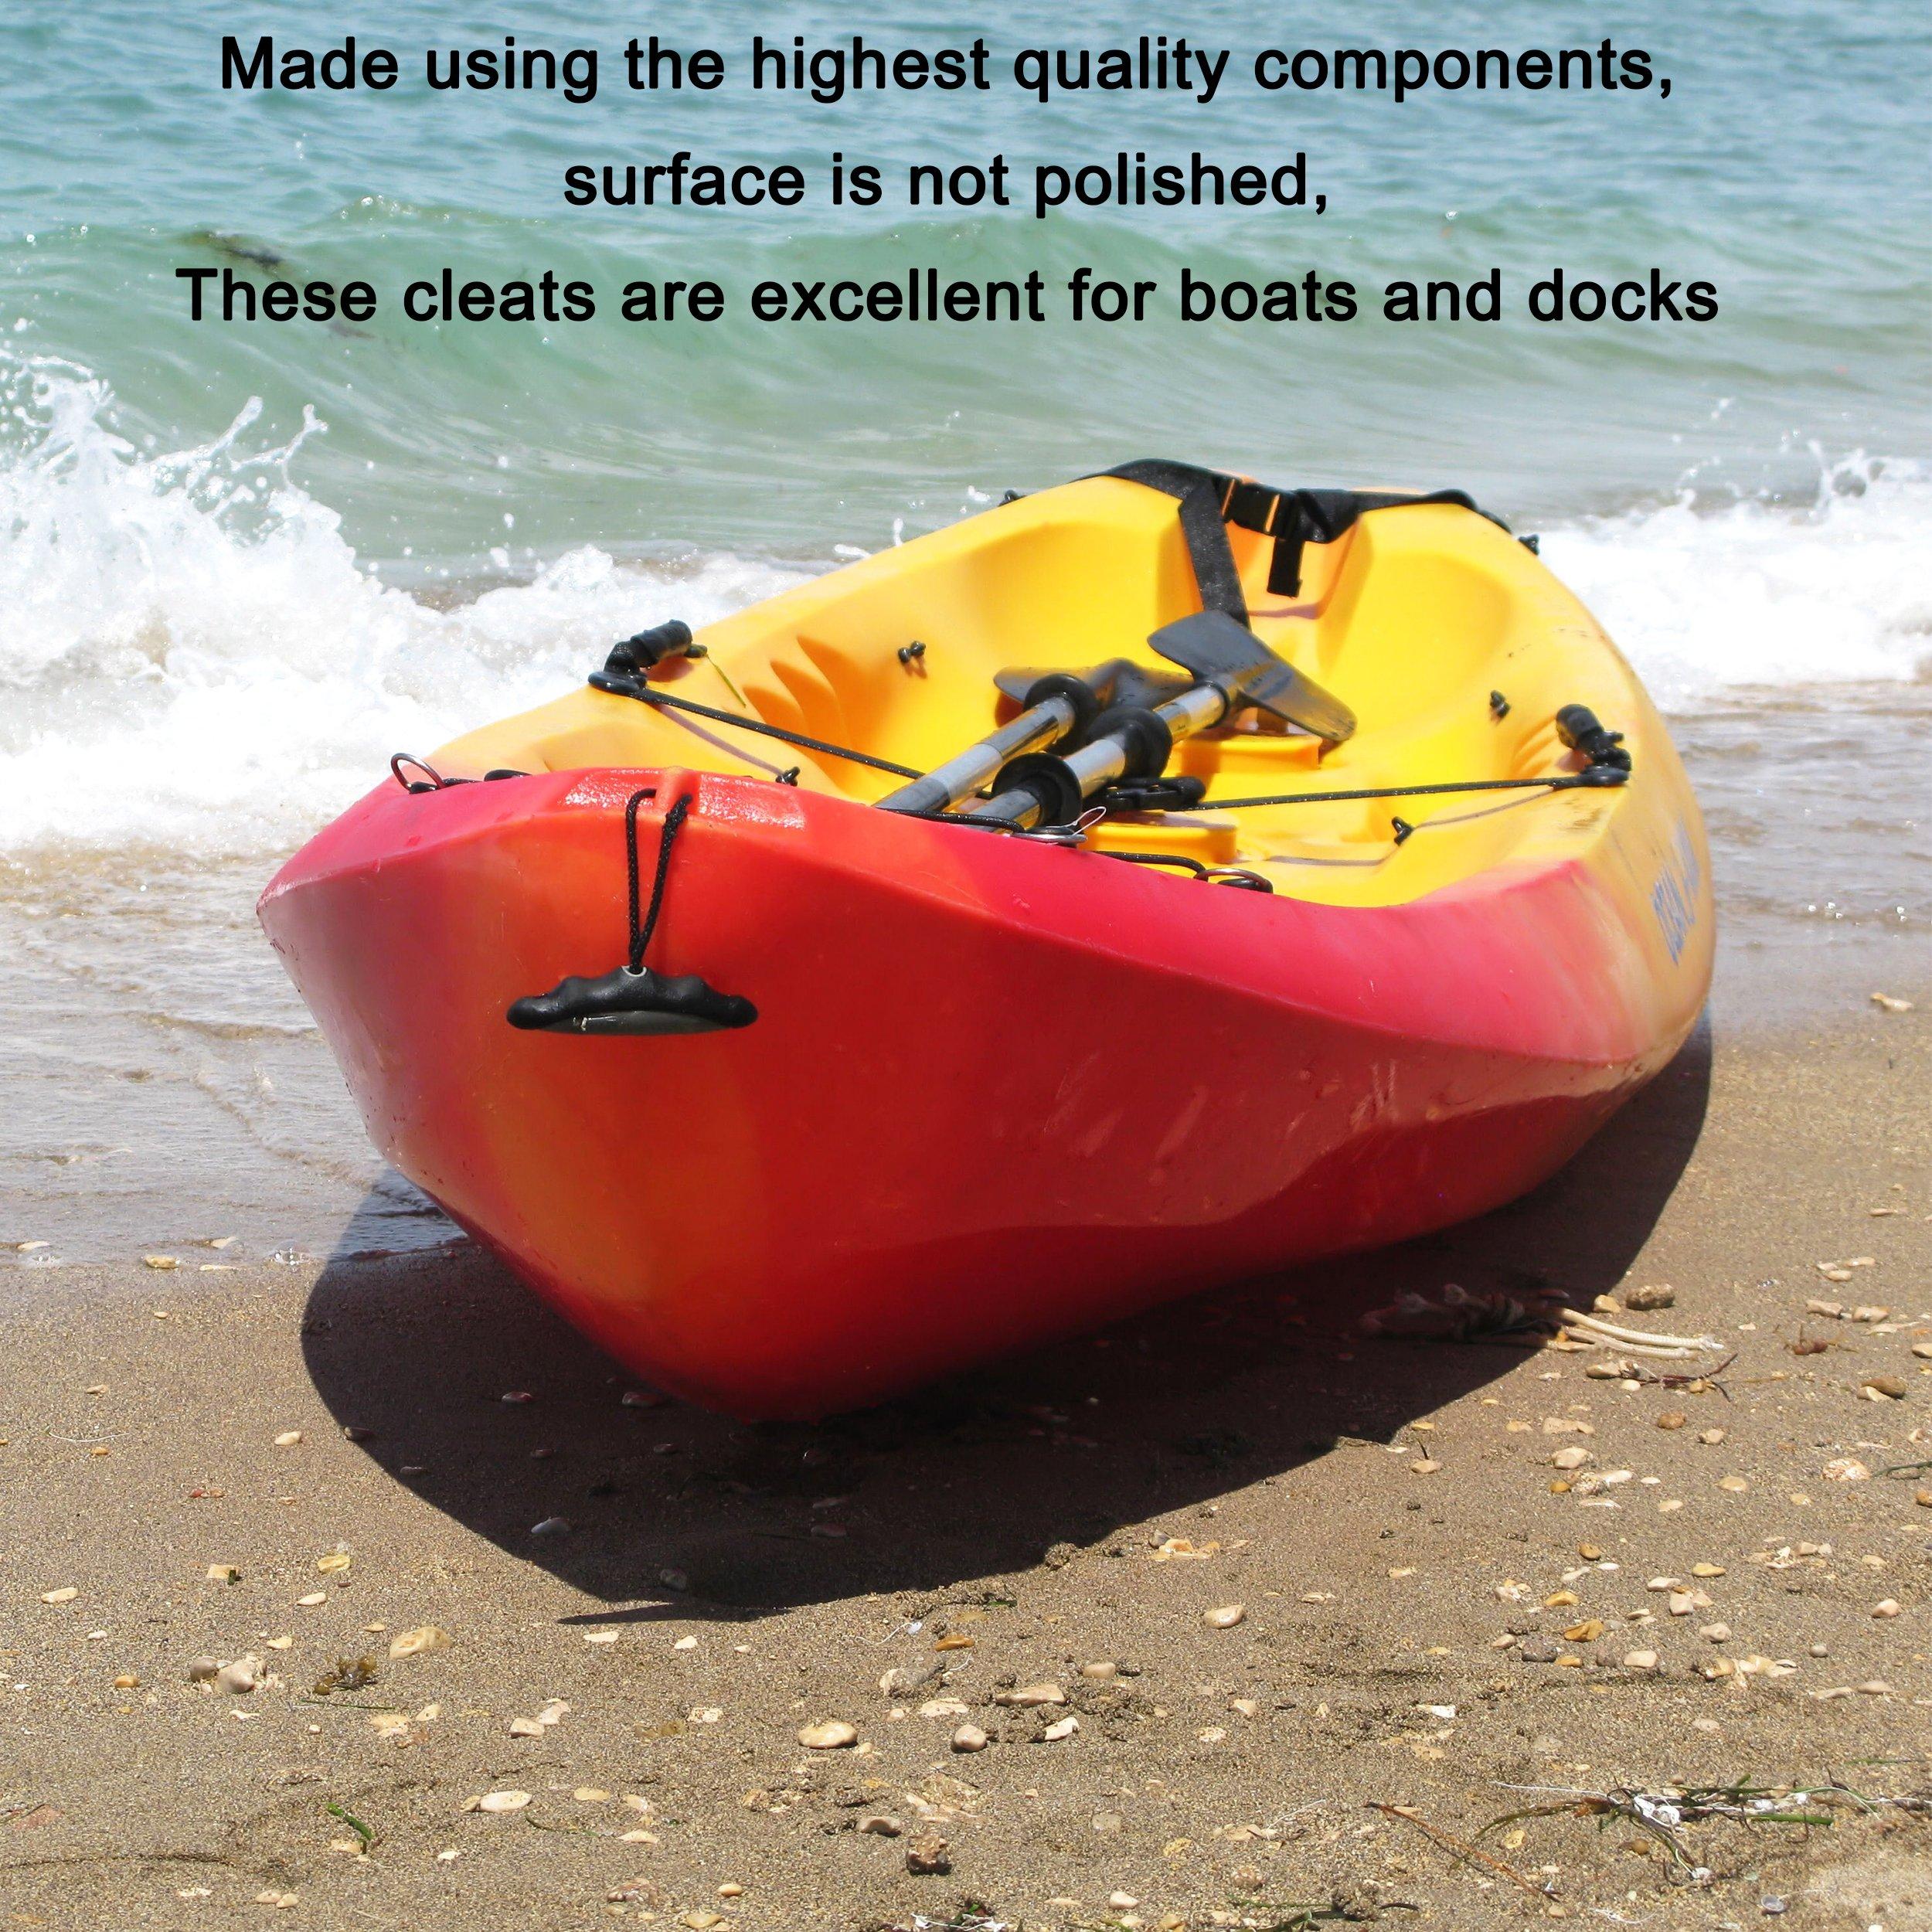 IZTOSS Marine Boat Dock Nylon Cleat 6-1/2'' Black Pack of 4 by IZTOSS (Image #6)